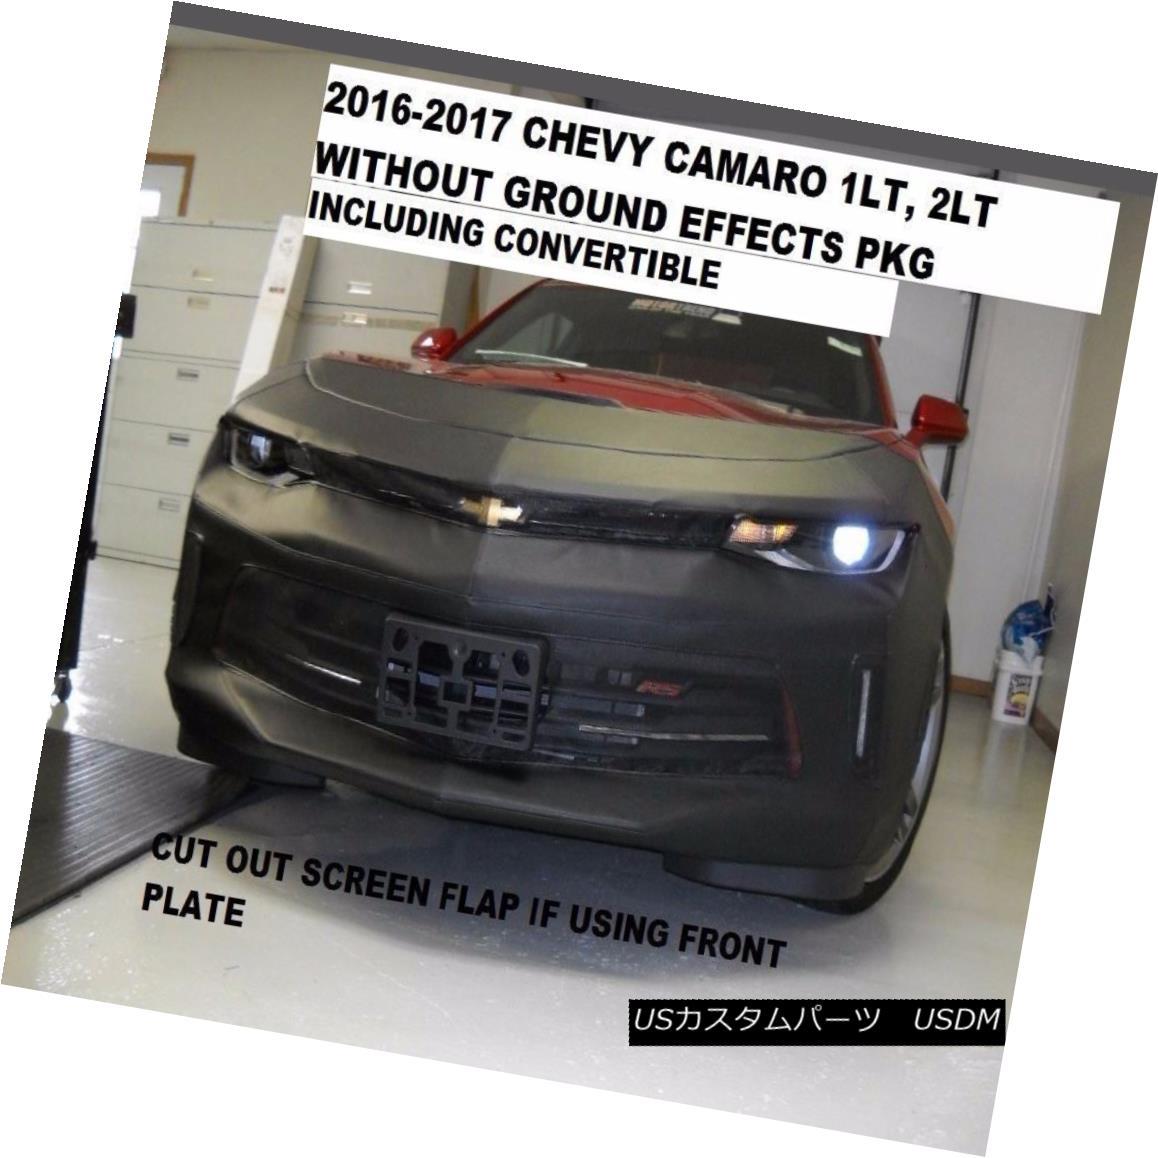 & Lebraフロントエンドマスクカバーブラフィット2016-2018 ノーズブラ Fits 1LT Cover Mask フルブラ 2016-2018 1LT& Bra End Front Chevy Lebra 2LT Camaro 2LT Chevy Camaro